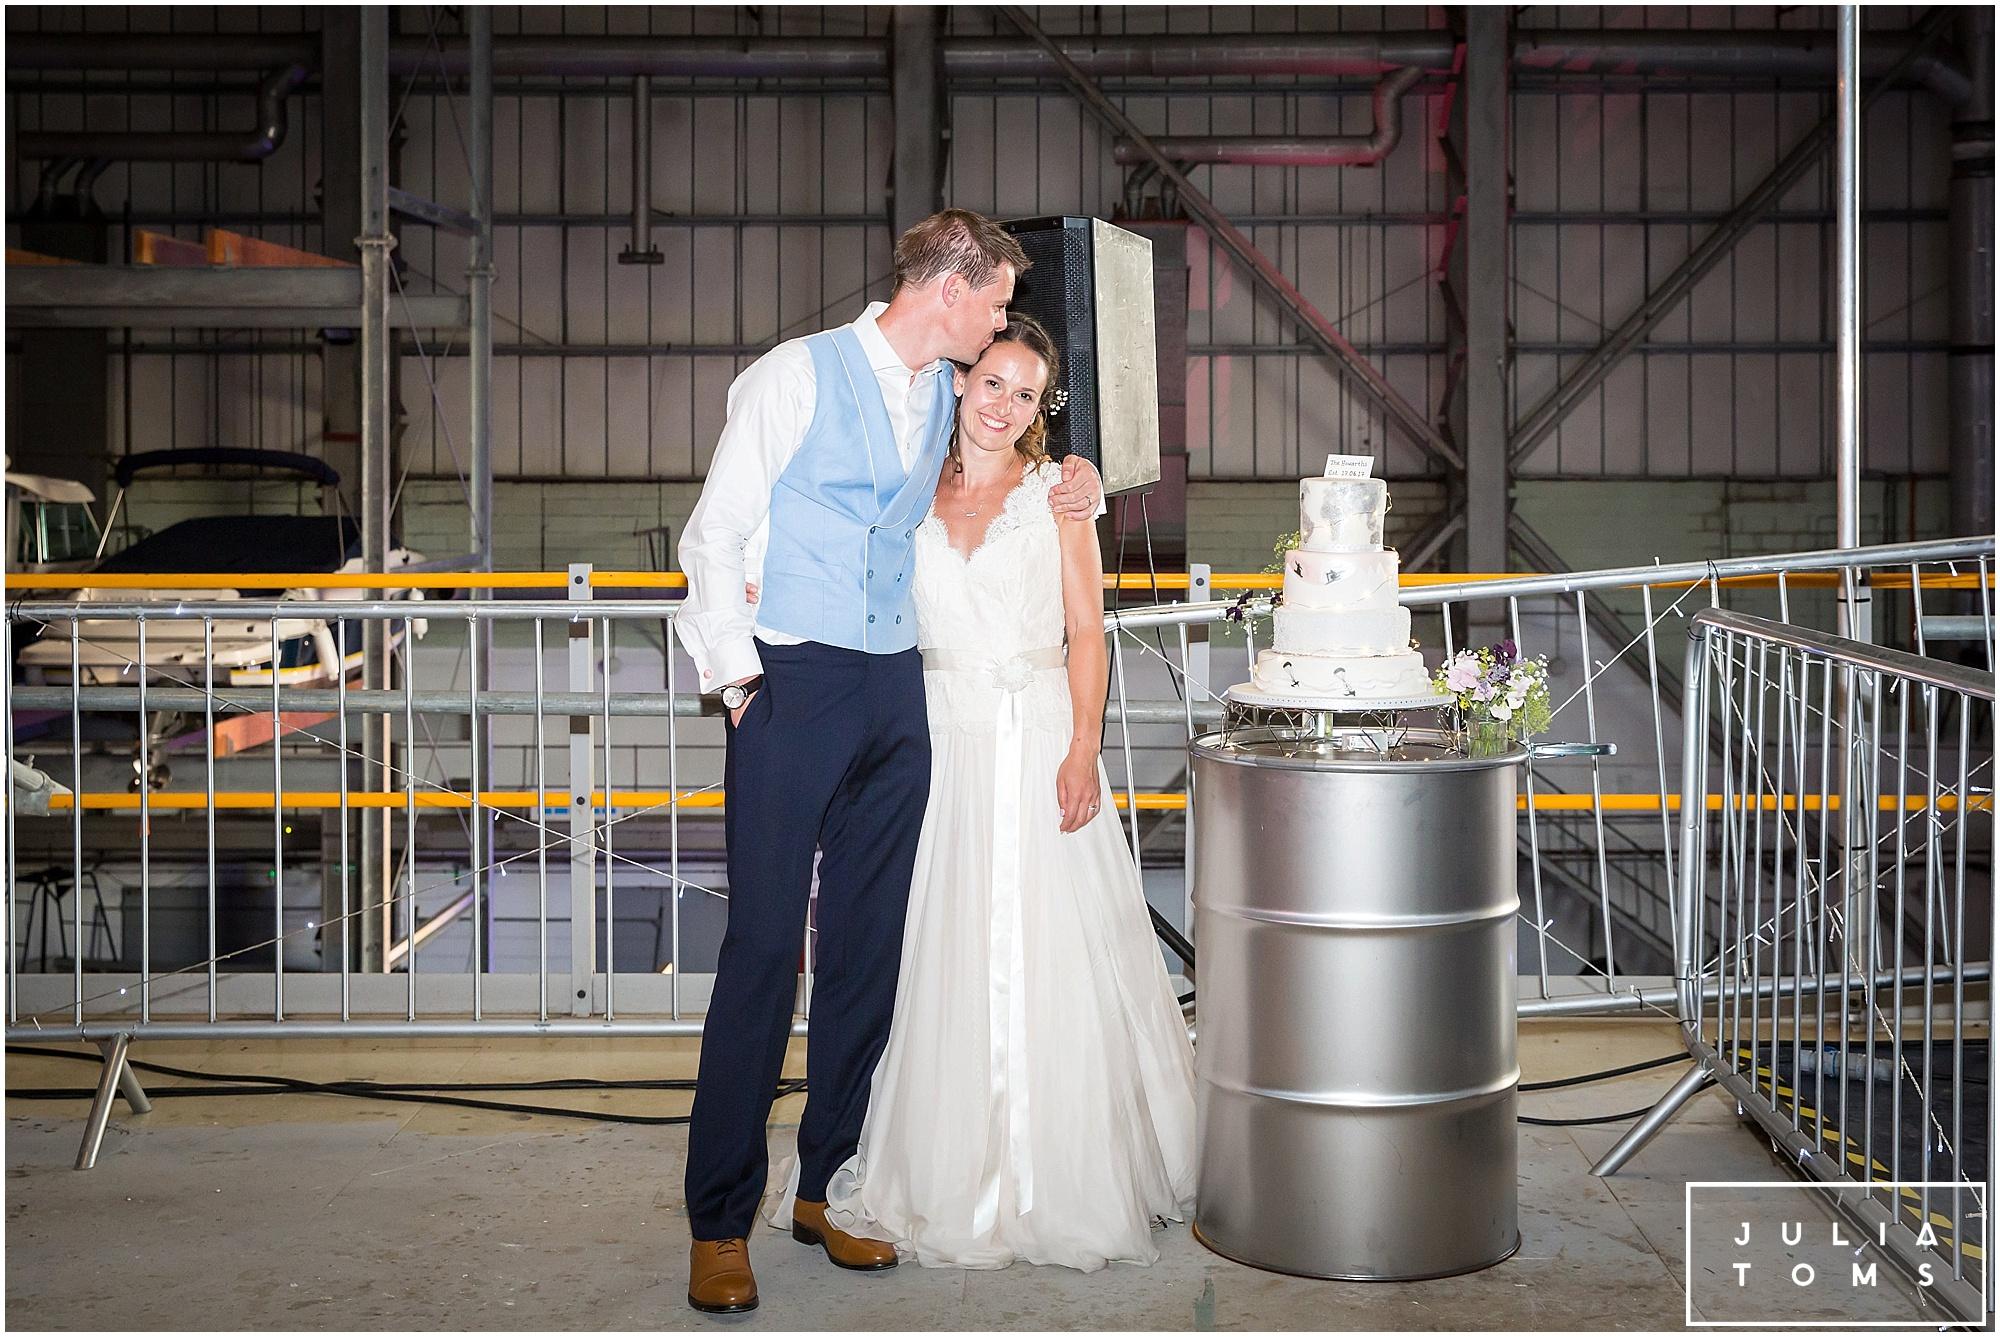 julia_toms_chichester_wedding_photographer_portsmouth_063.jpg